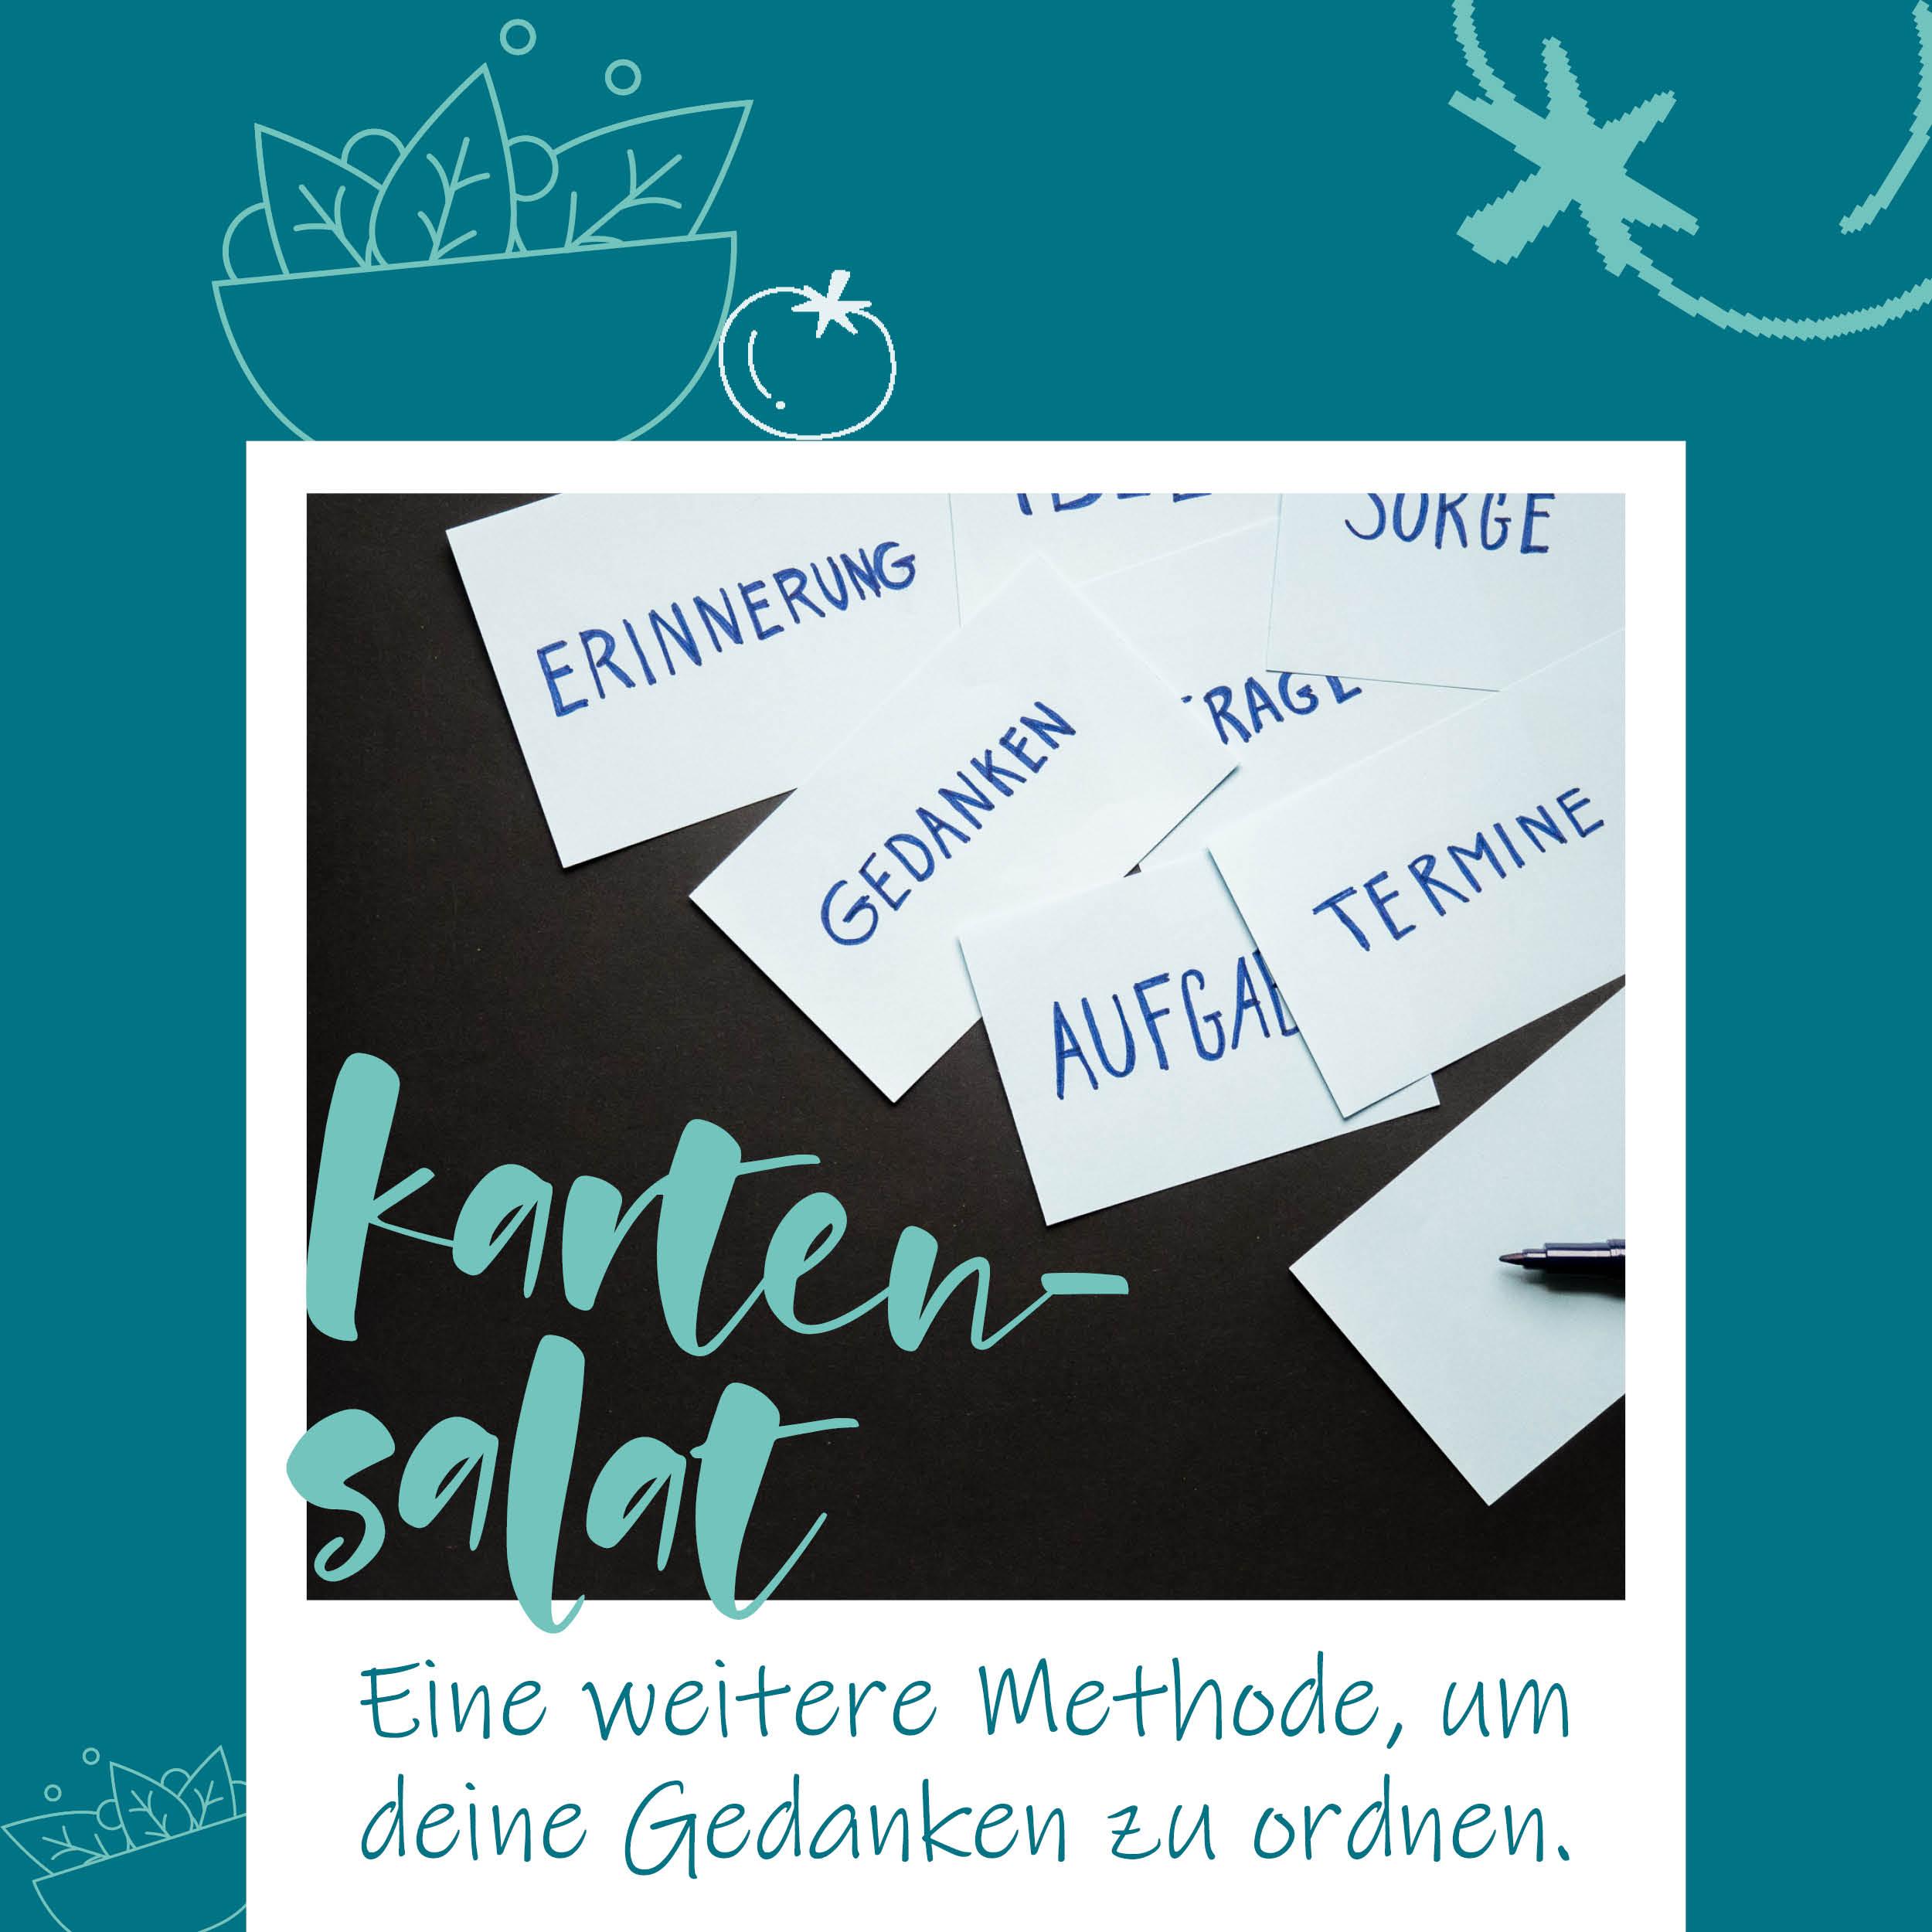 blauerEisberg_Karten-Salat_Gedanken ordnen